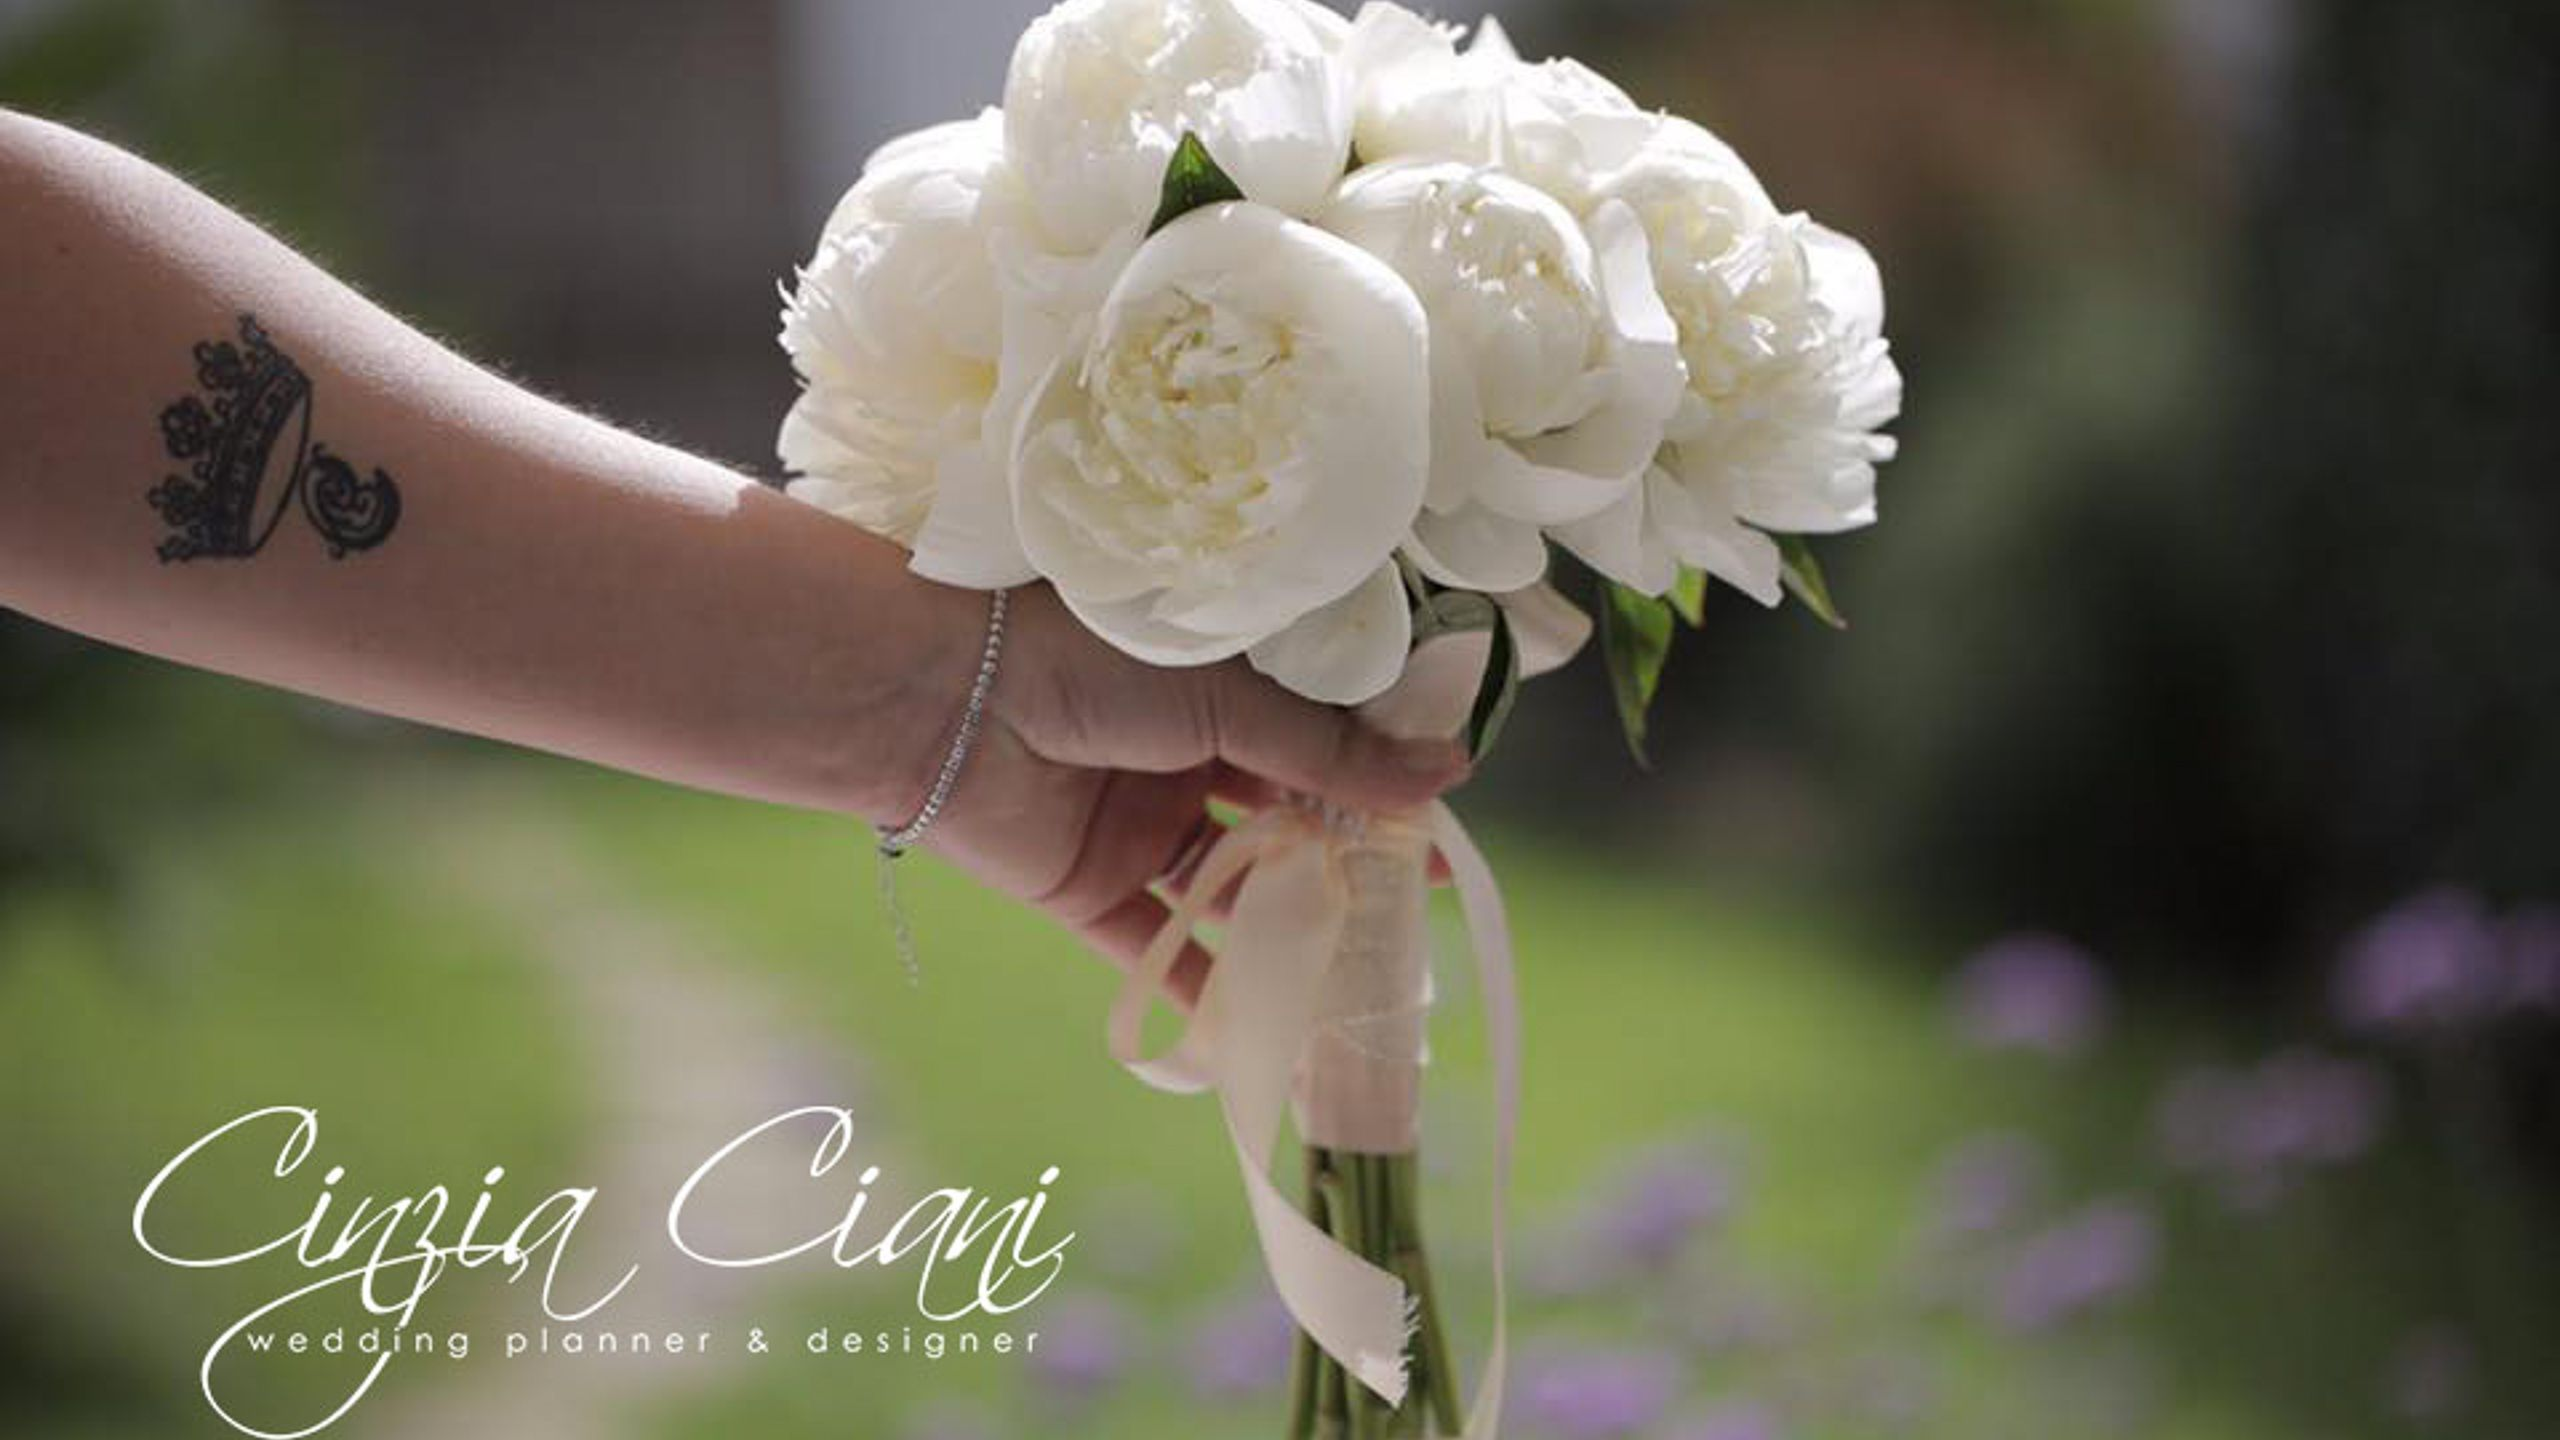 7263159052339051104-n-Wedding-Planner-Designer-Rome-cinzia-ciani-weddings-events